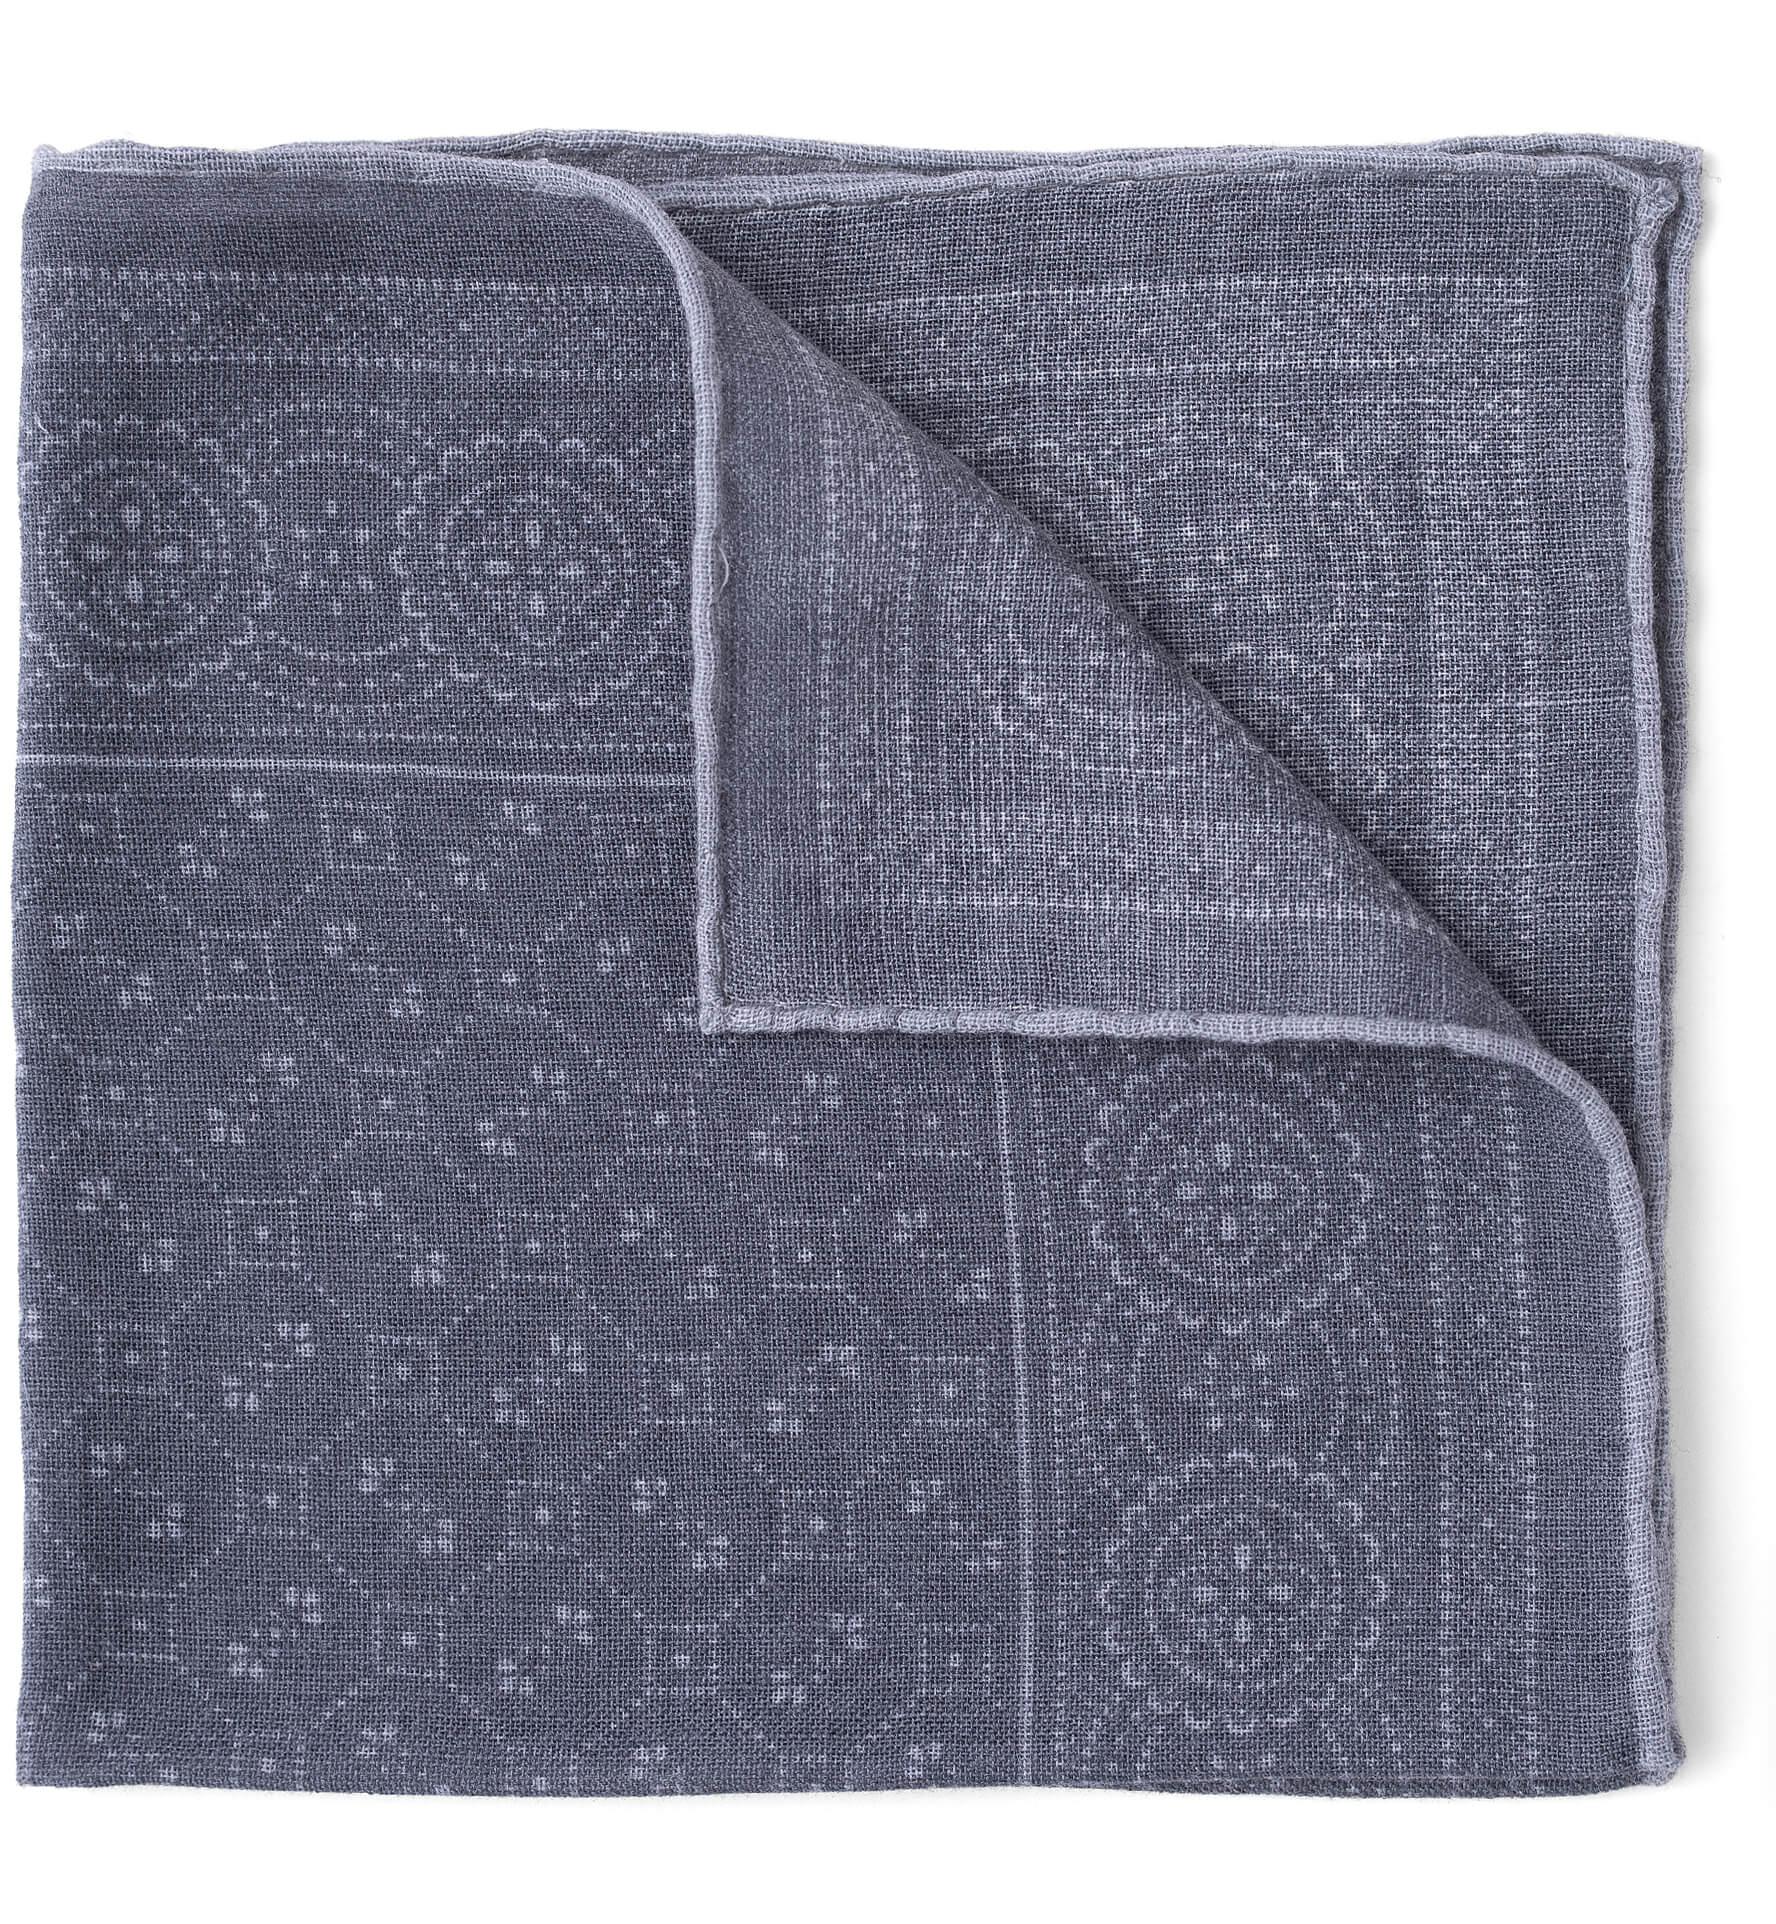 Zoom Image of Grey Bandana Print Wool Pocket Square